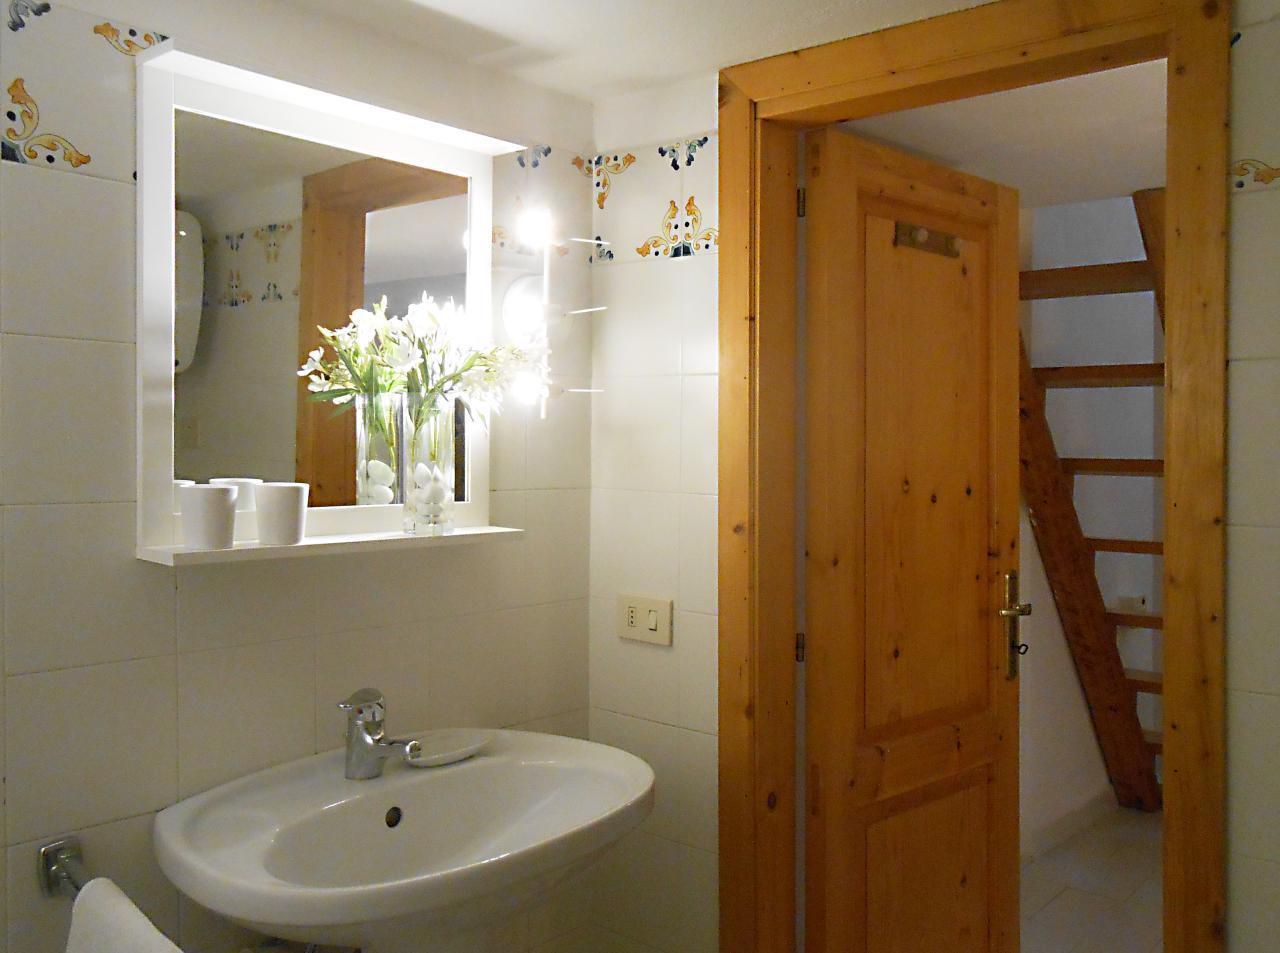 Maison de vacances Ferienhaushälfte Oleandro auf sizilianischer Insel mit atemberaubenden Meeres-Rundblick (2045159), Lipari, Lipari, Sicile, Italie, image 34